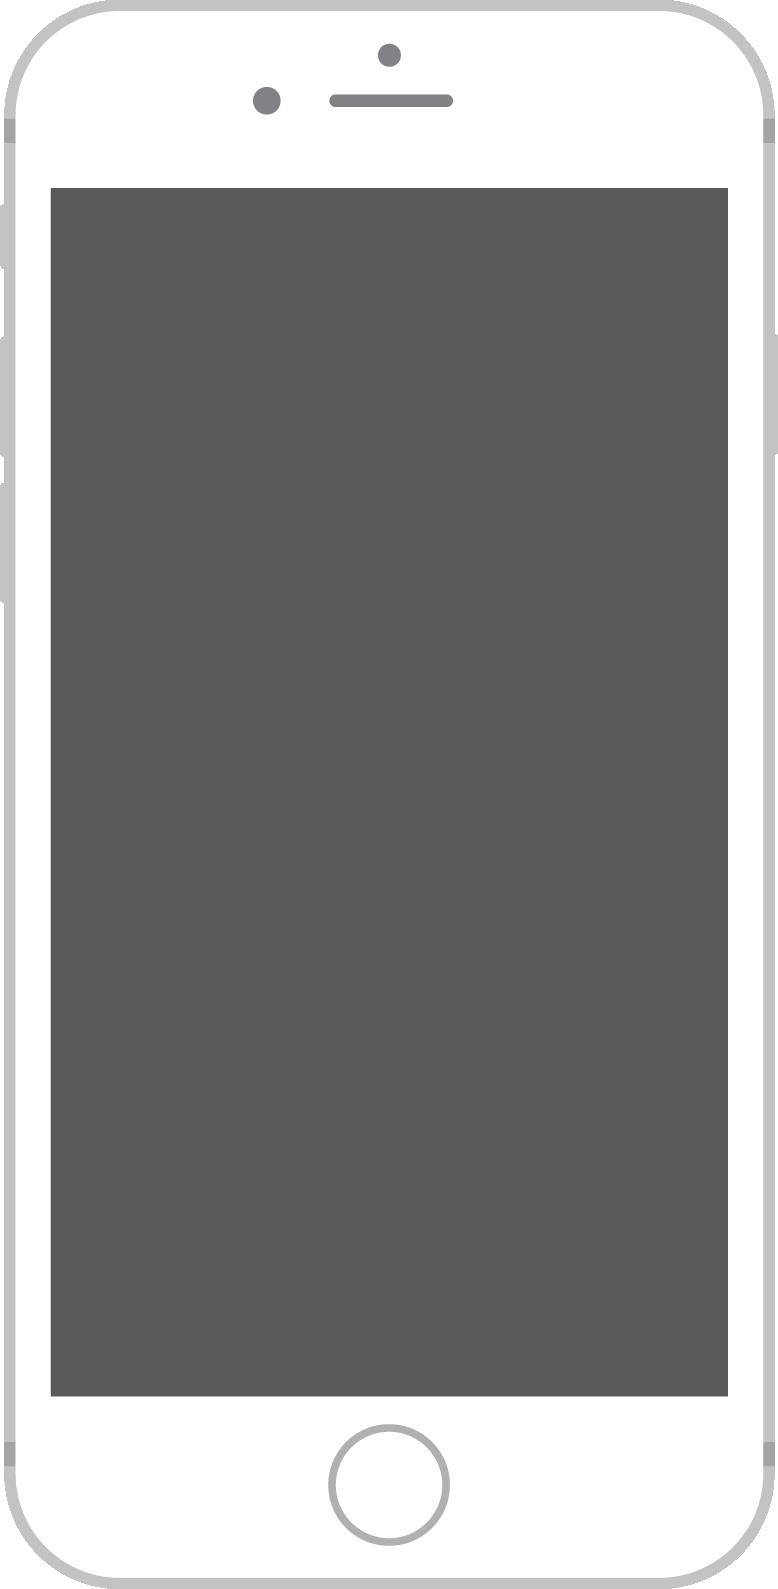 iphone_6 background